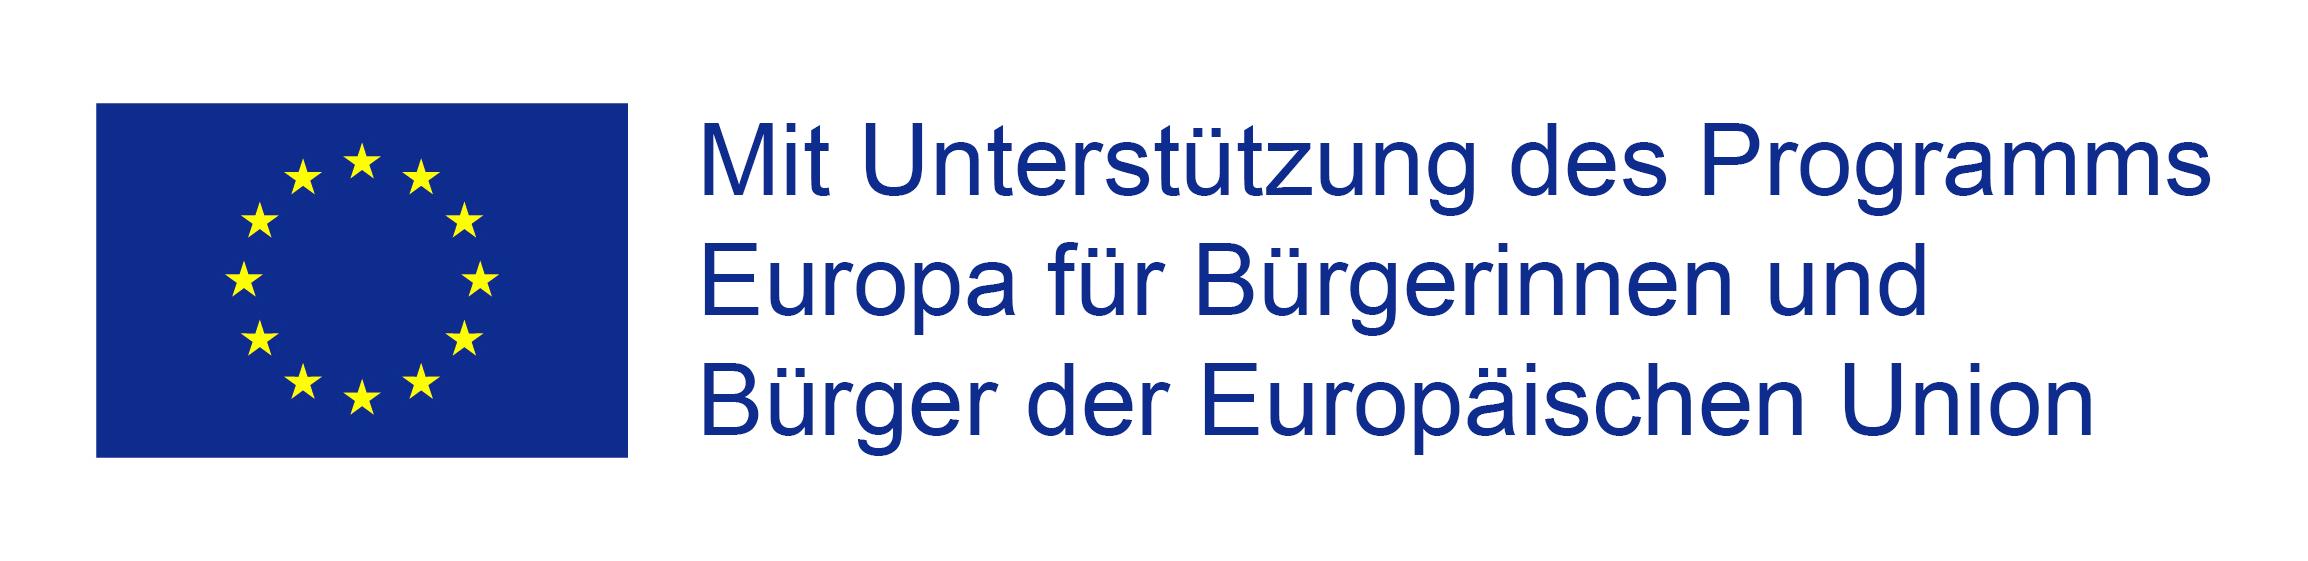 europe_for_citizens_programme_logo-